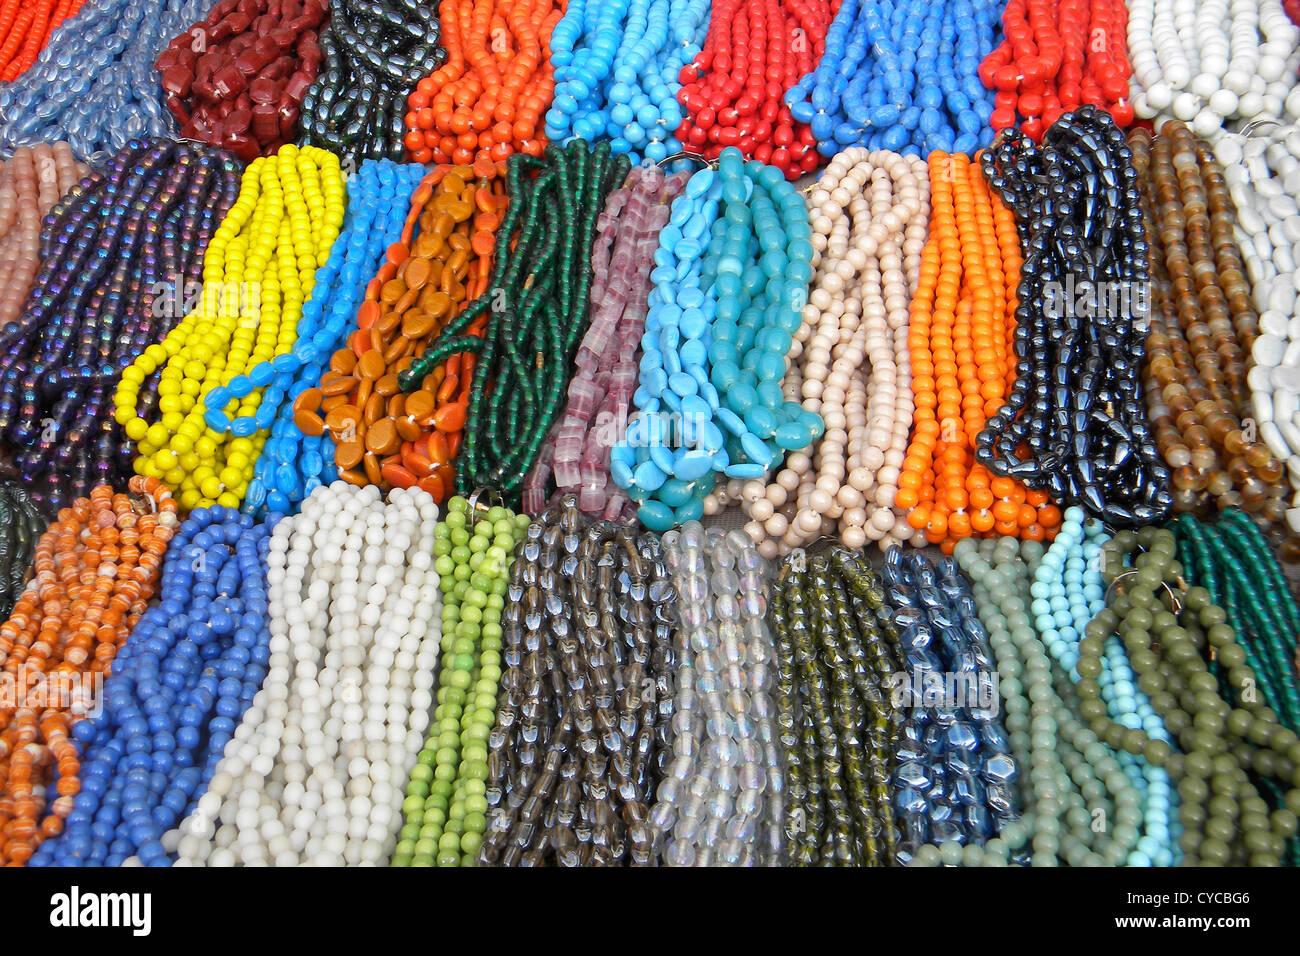 India, Tamil Nadu, Chennai, necklace - Stock Image